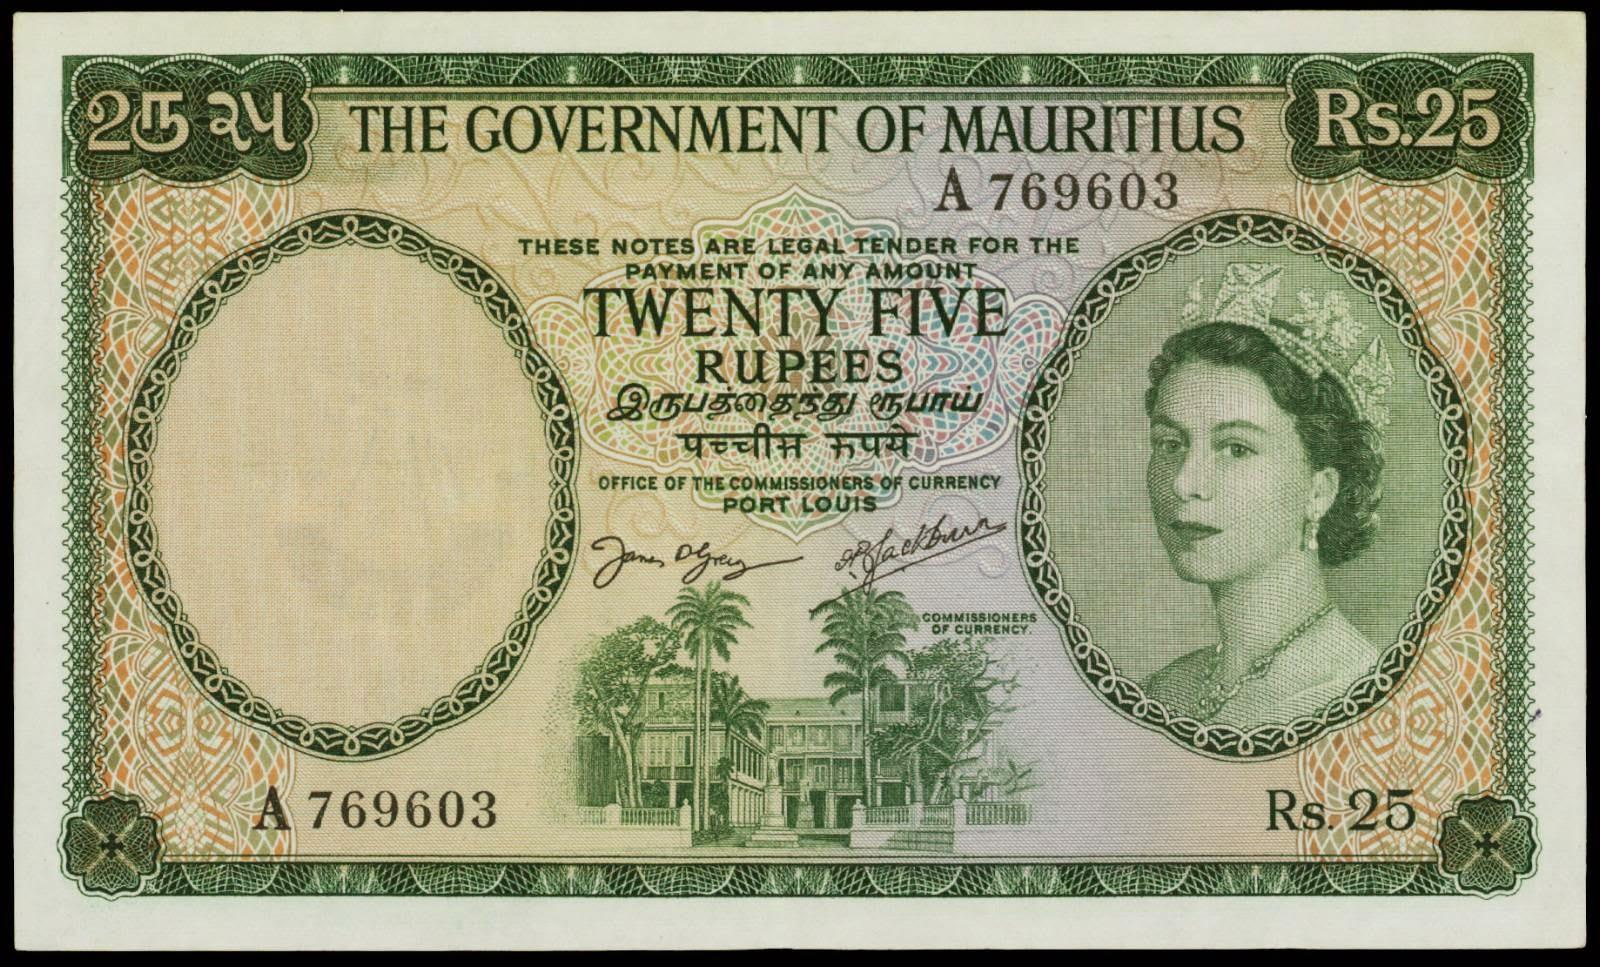 Mauritius banknotes 25 Rupees note 1954 Queen Elizabeth II